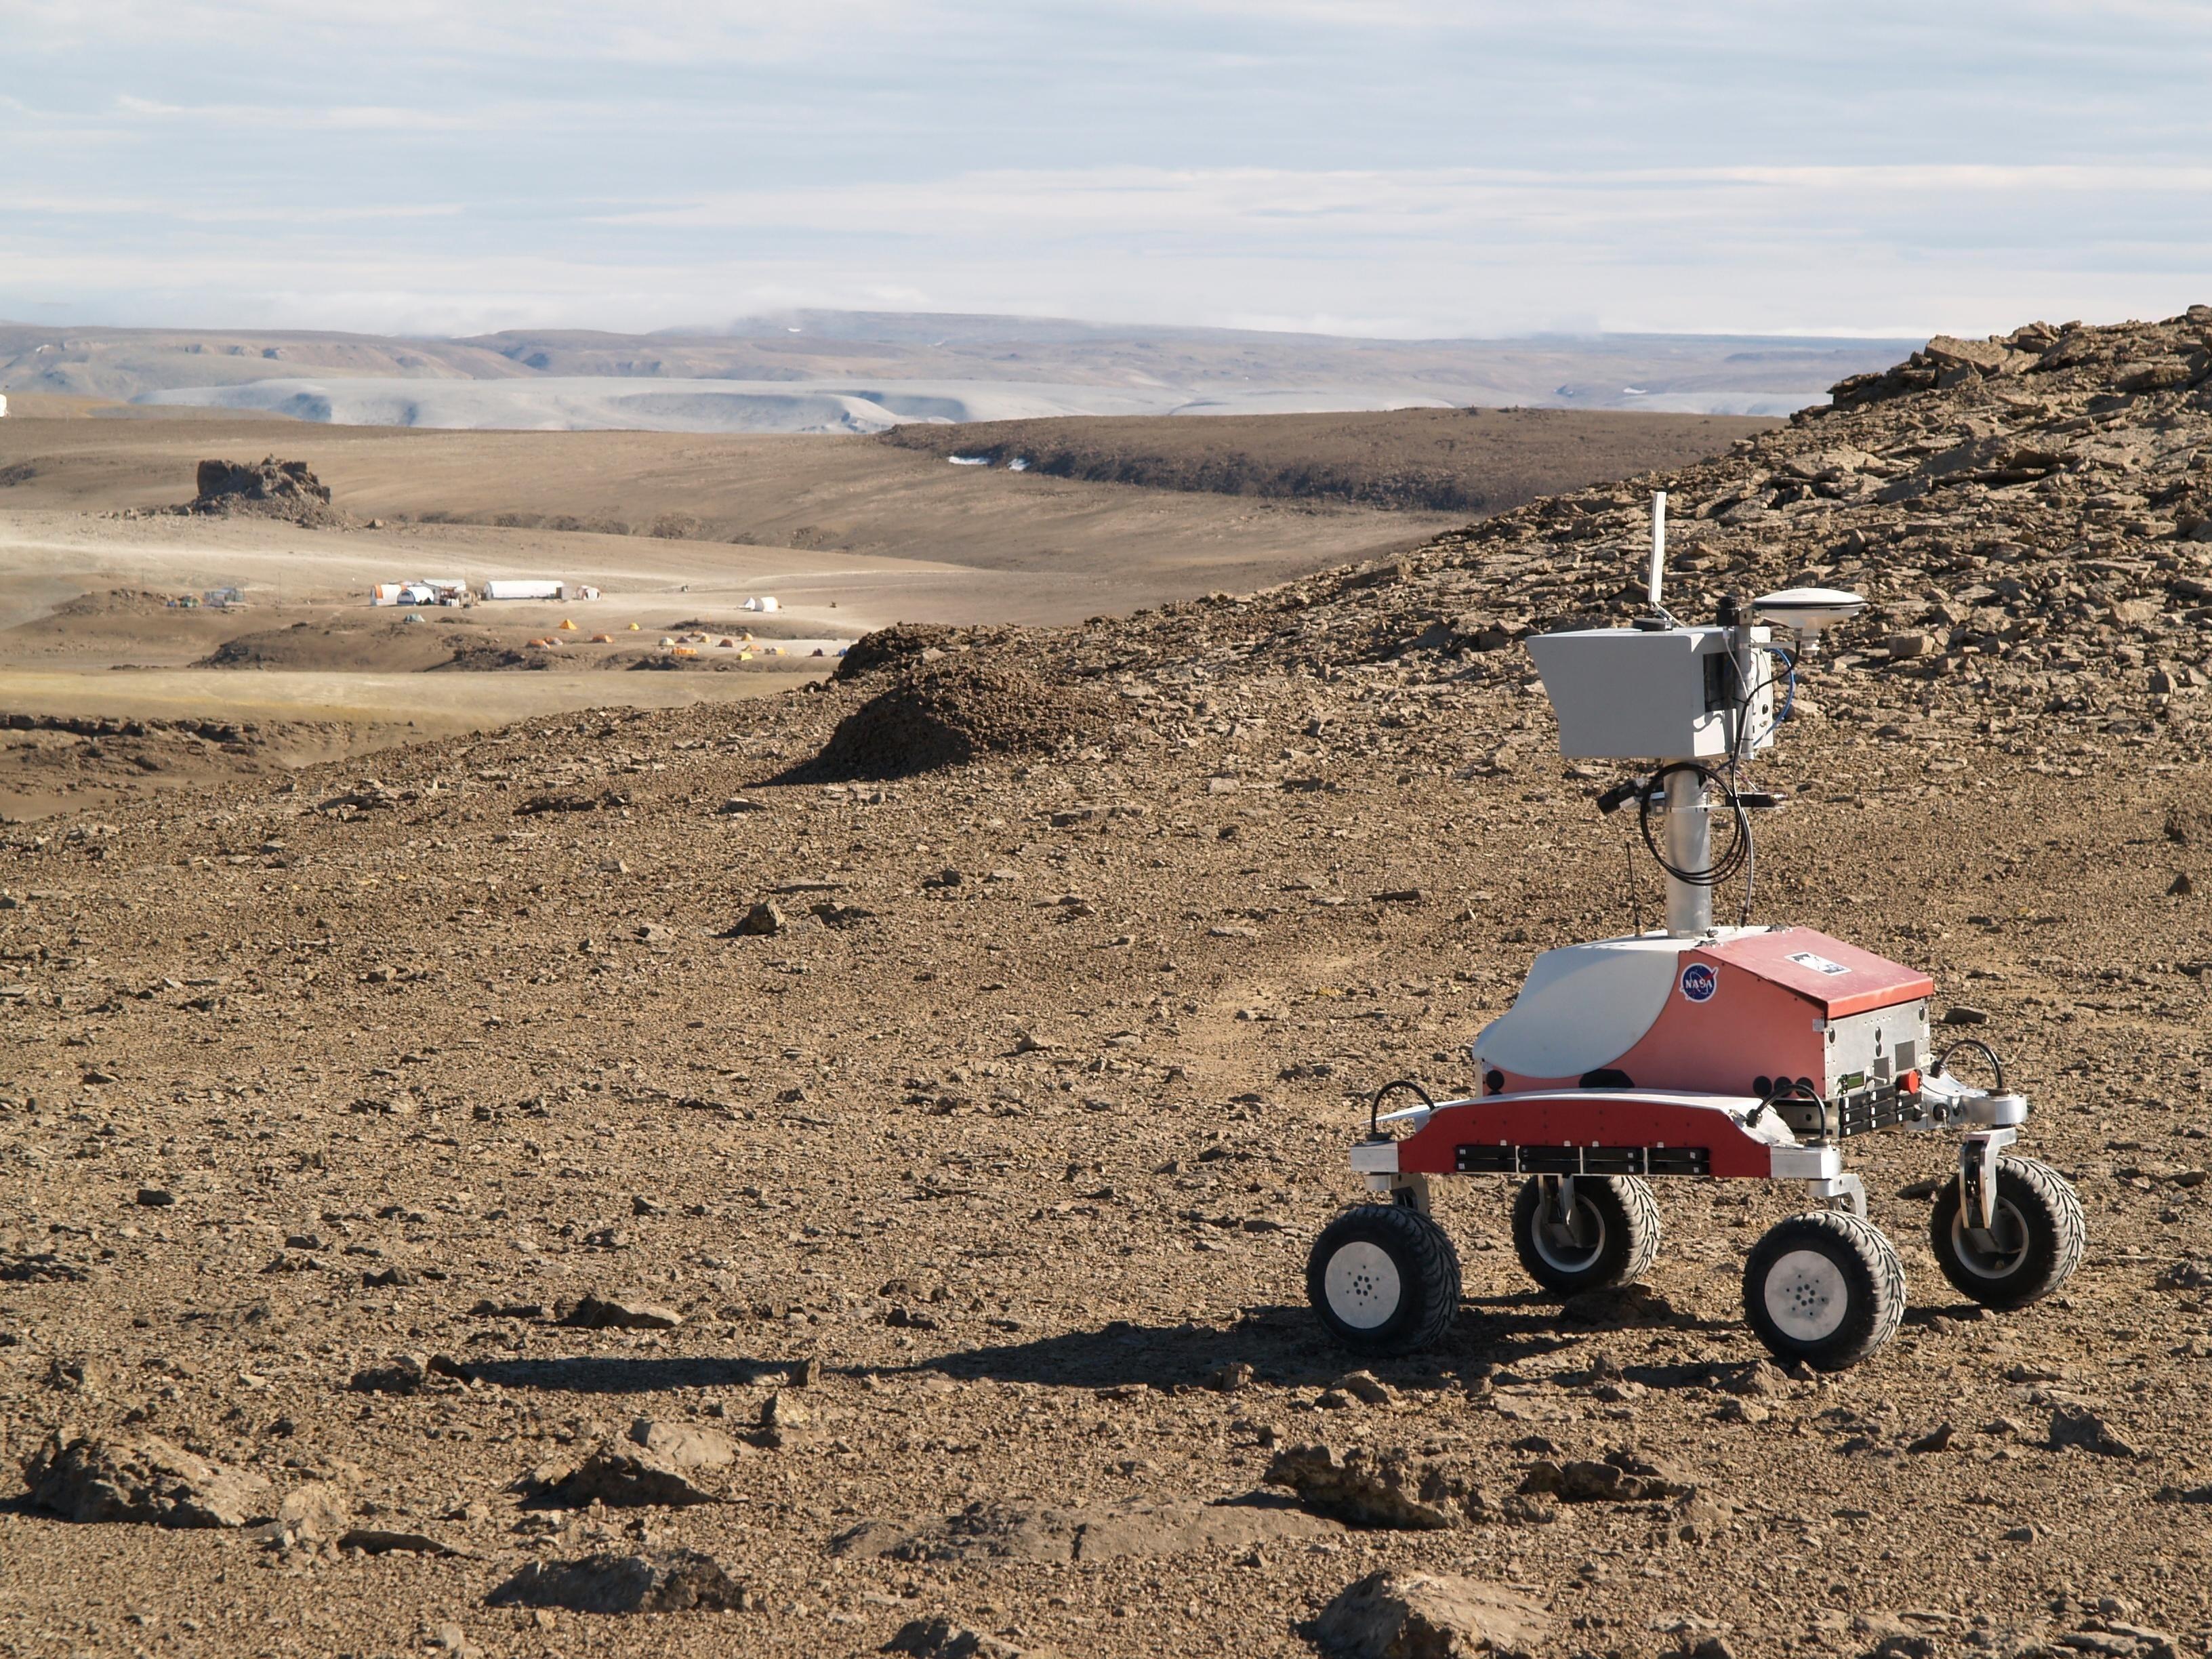 mars rover q5 - photo #17